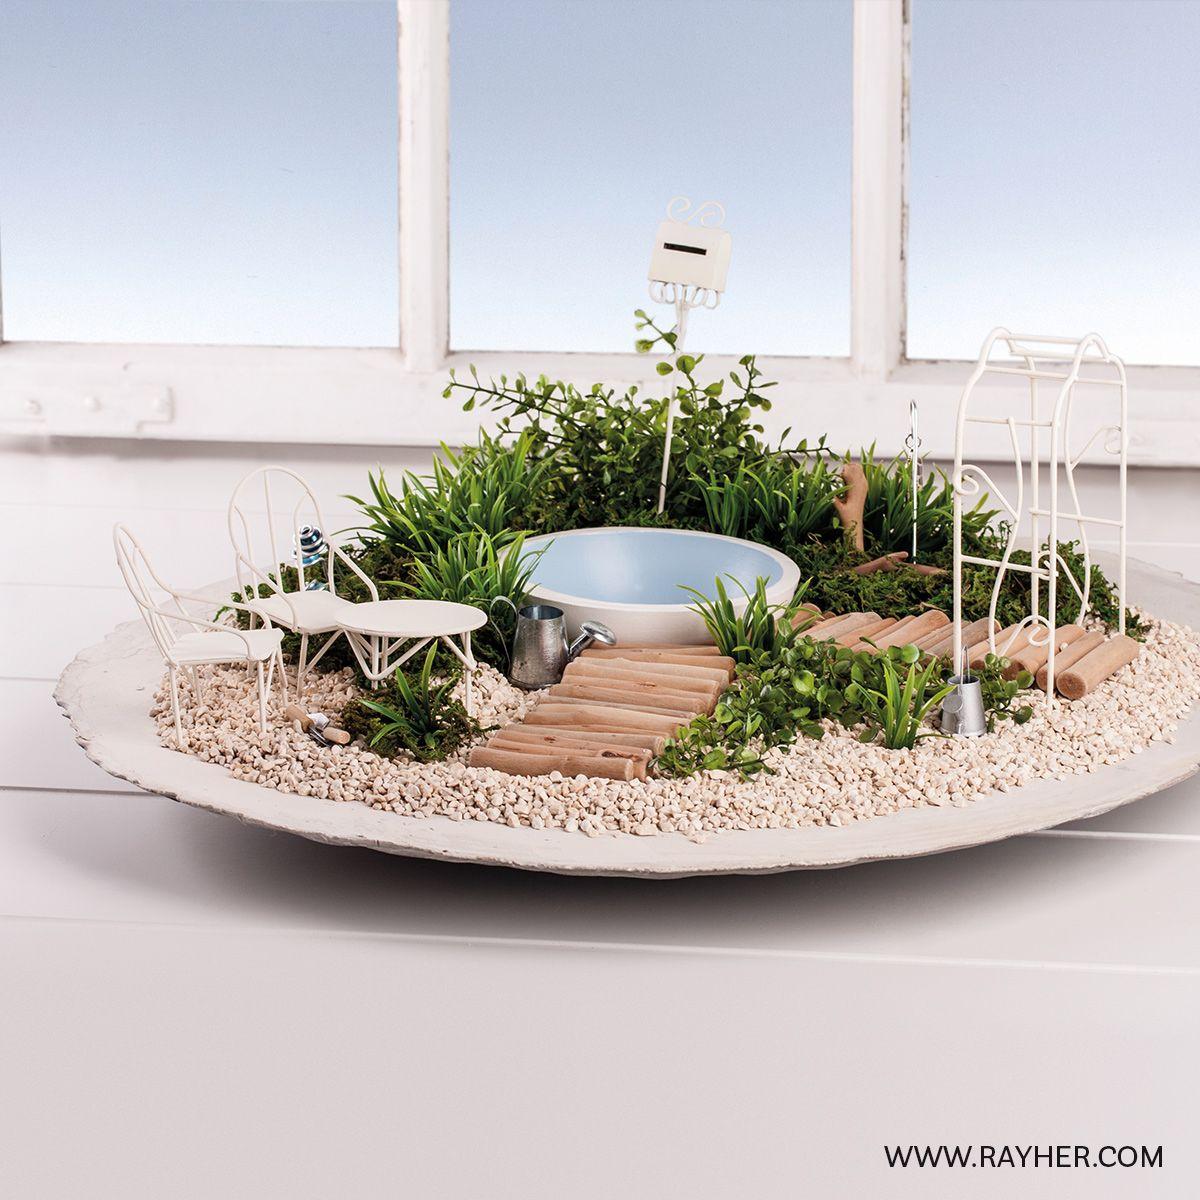 mini gardening minigarten mit pool mini gardening. Black Bedroom Furniture Sets. Home Design Ideas